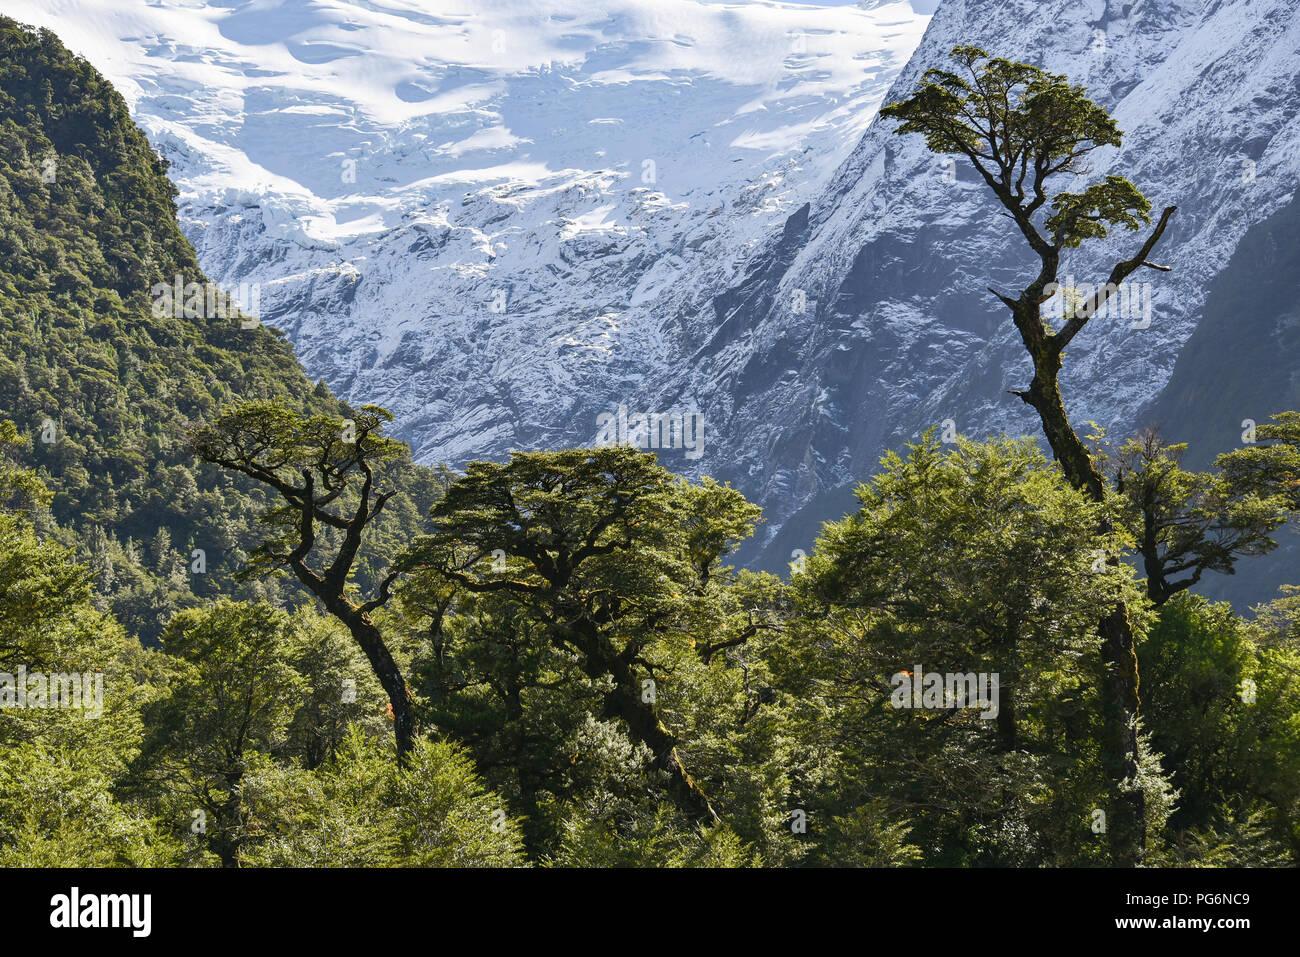 El Bosque Encantado, enchanted or Charmed Forest with Queulat Glacier, Carratera Austral, Queulat National Park, Cisnes, Aysen - Stock Image